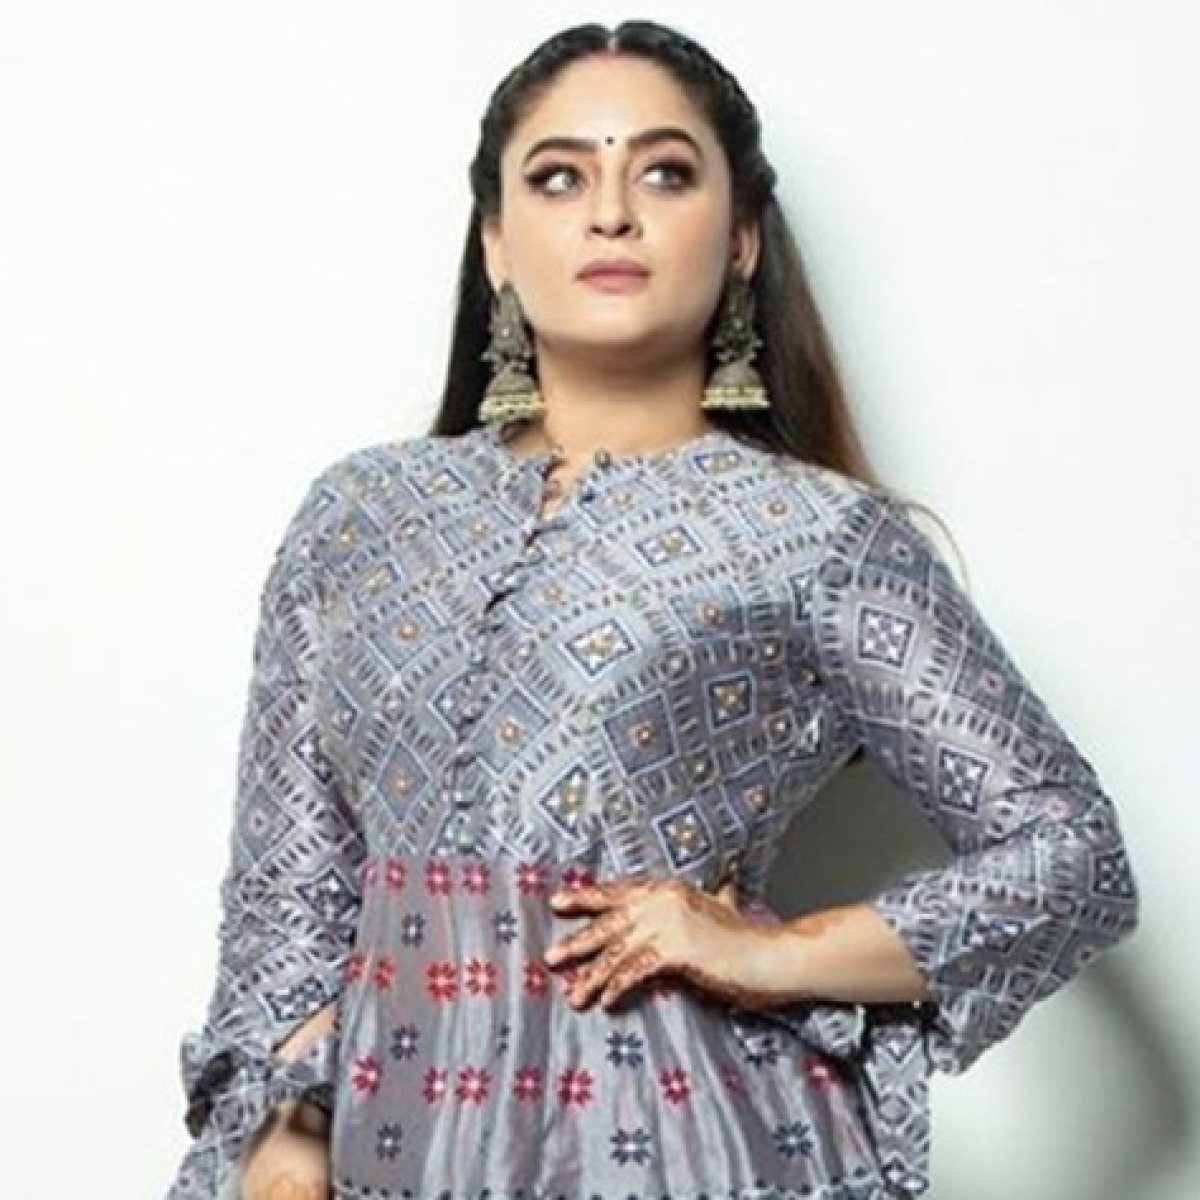 Mahhi Vij slams troll who body-shamed her over post-pregnancy weight gain